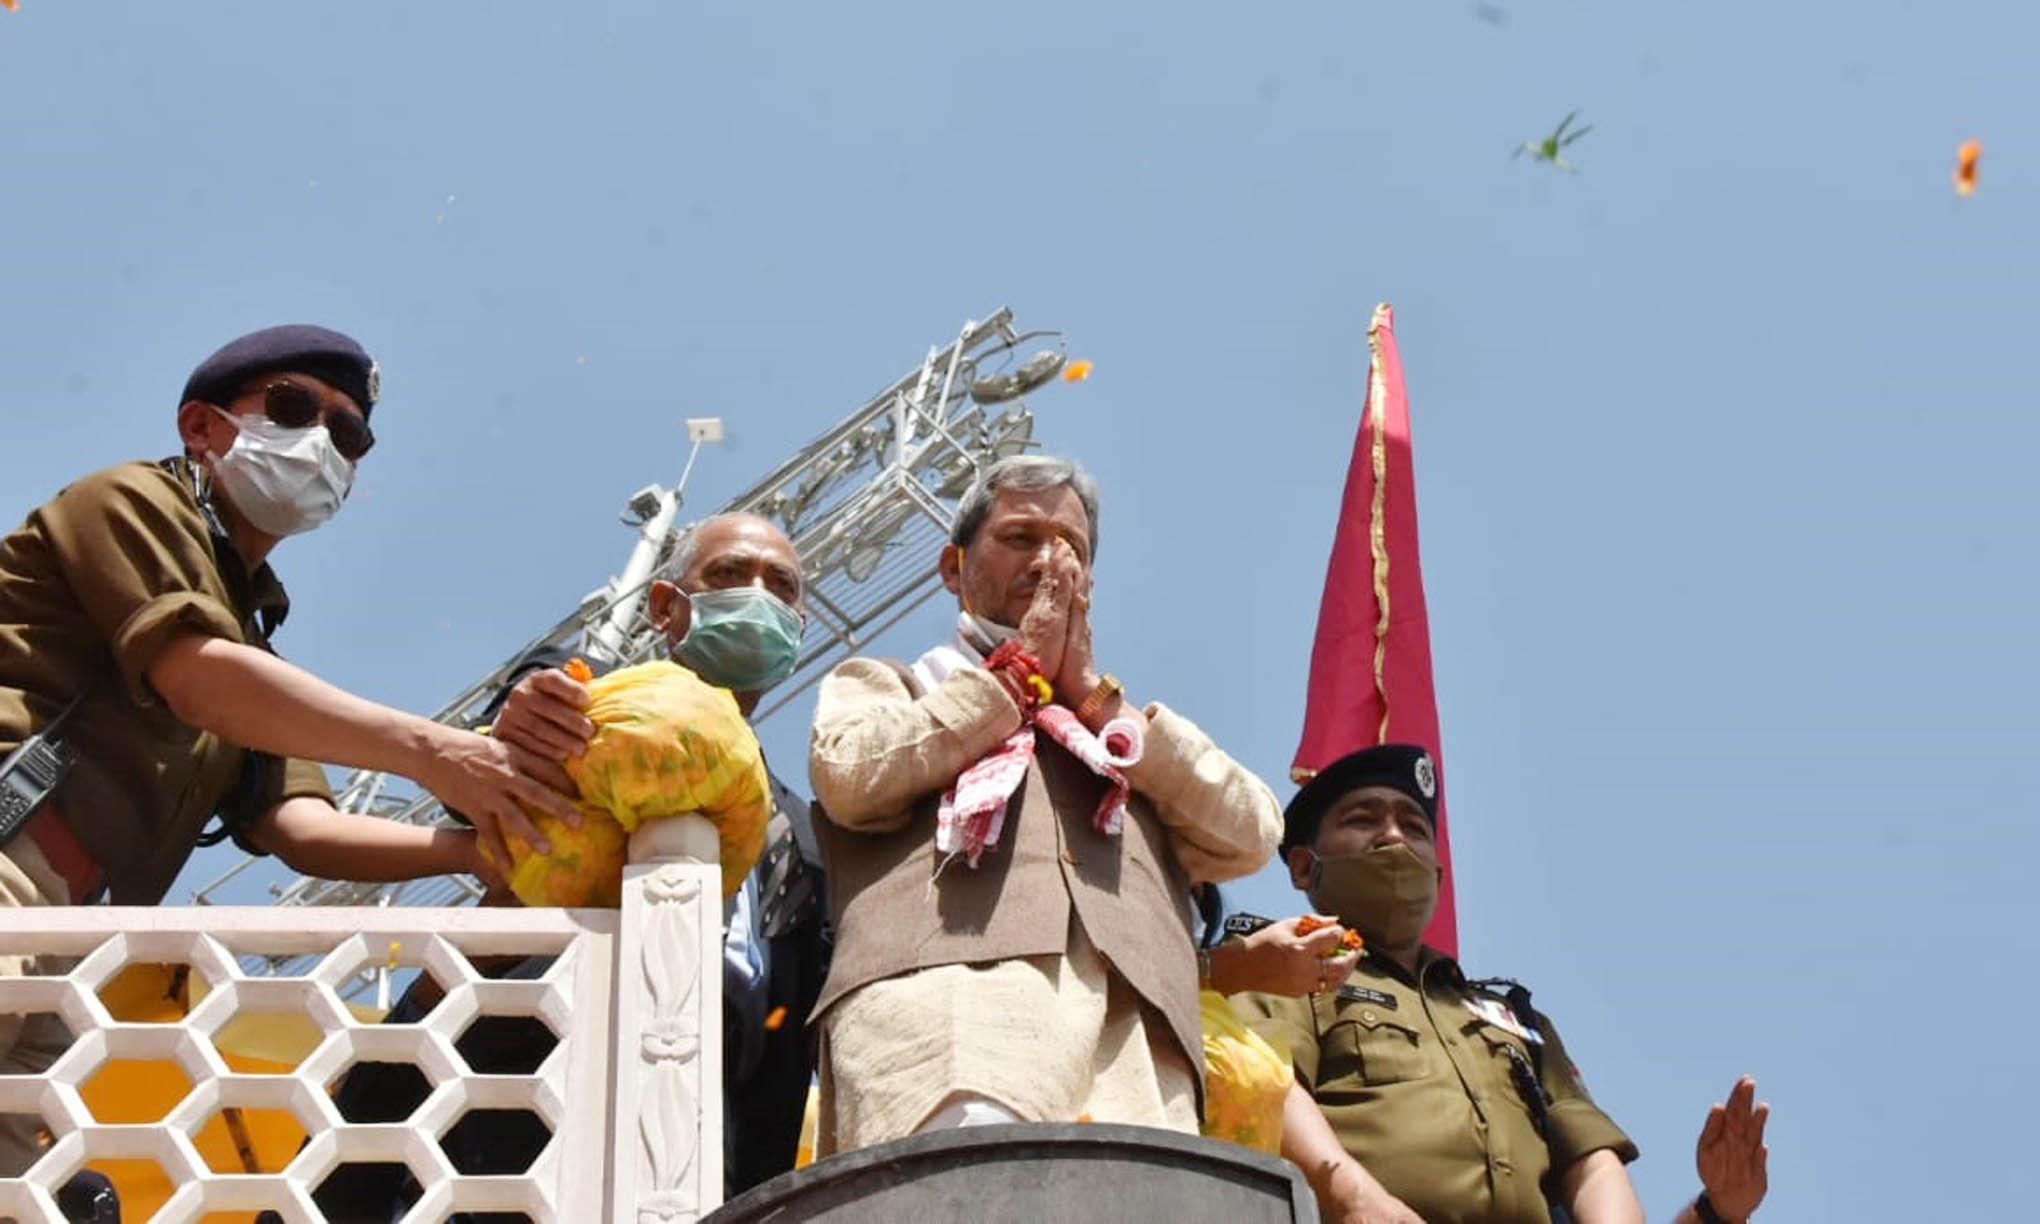 Chief Minister Shri Tirath Singh Rawat reached Har ki Paidi Haridwar